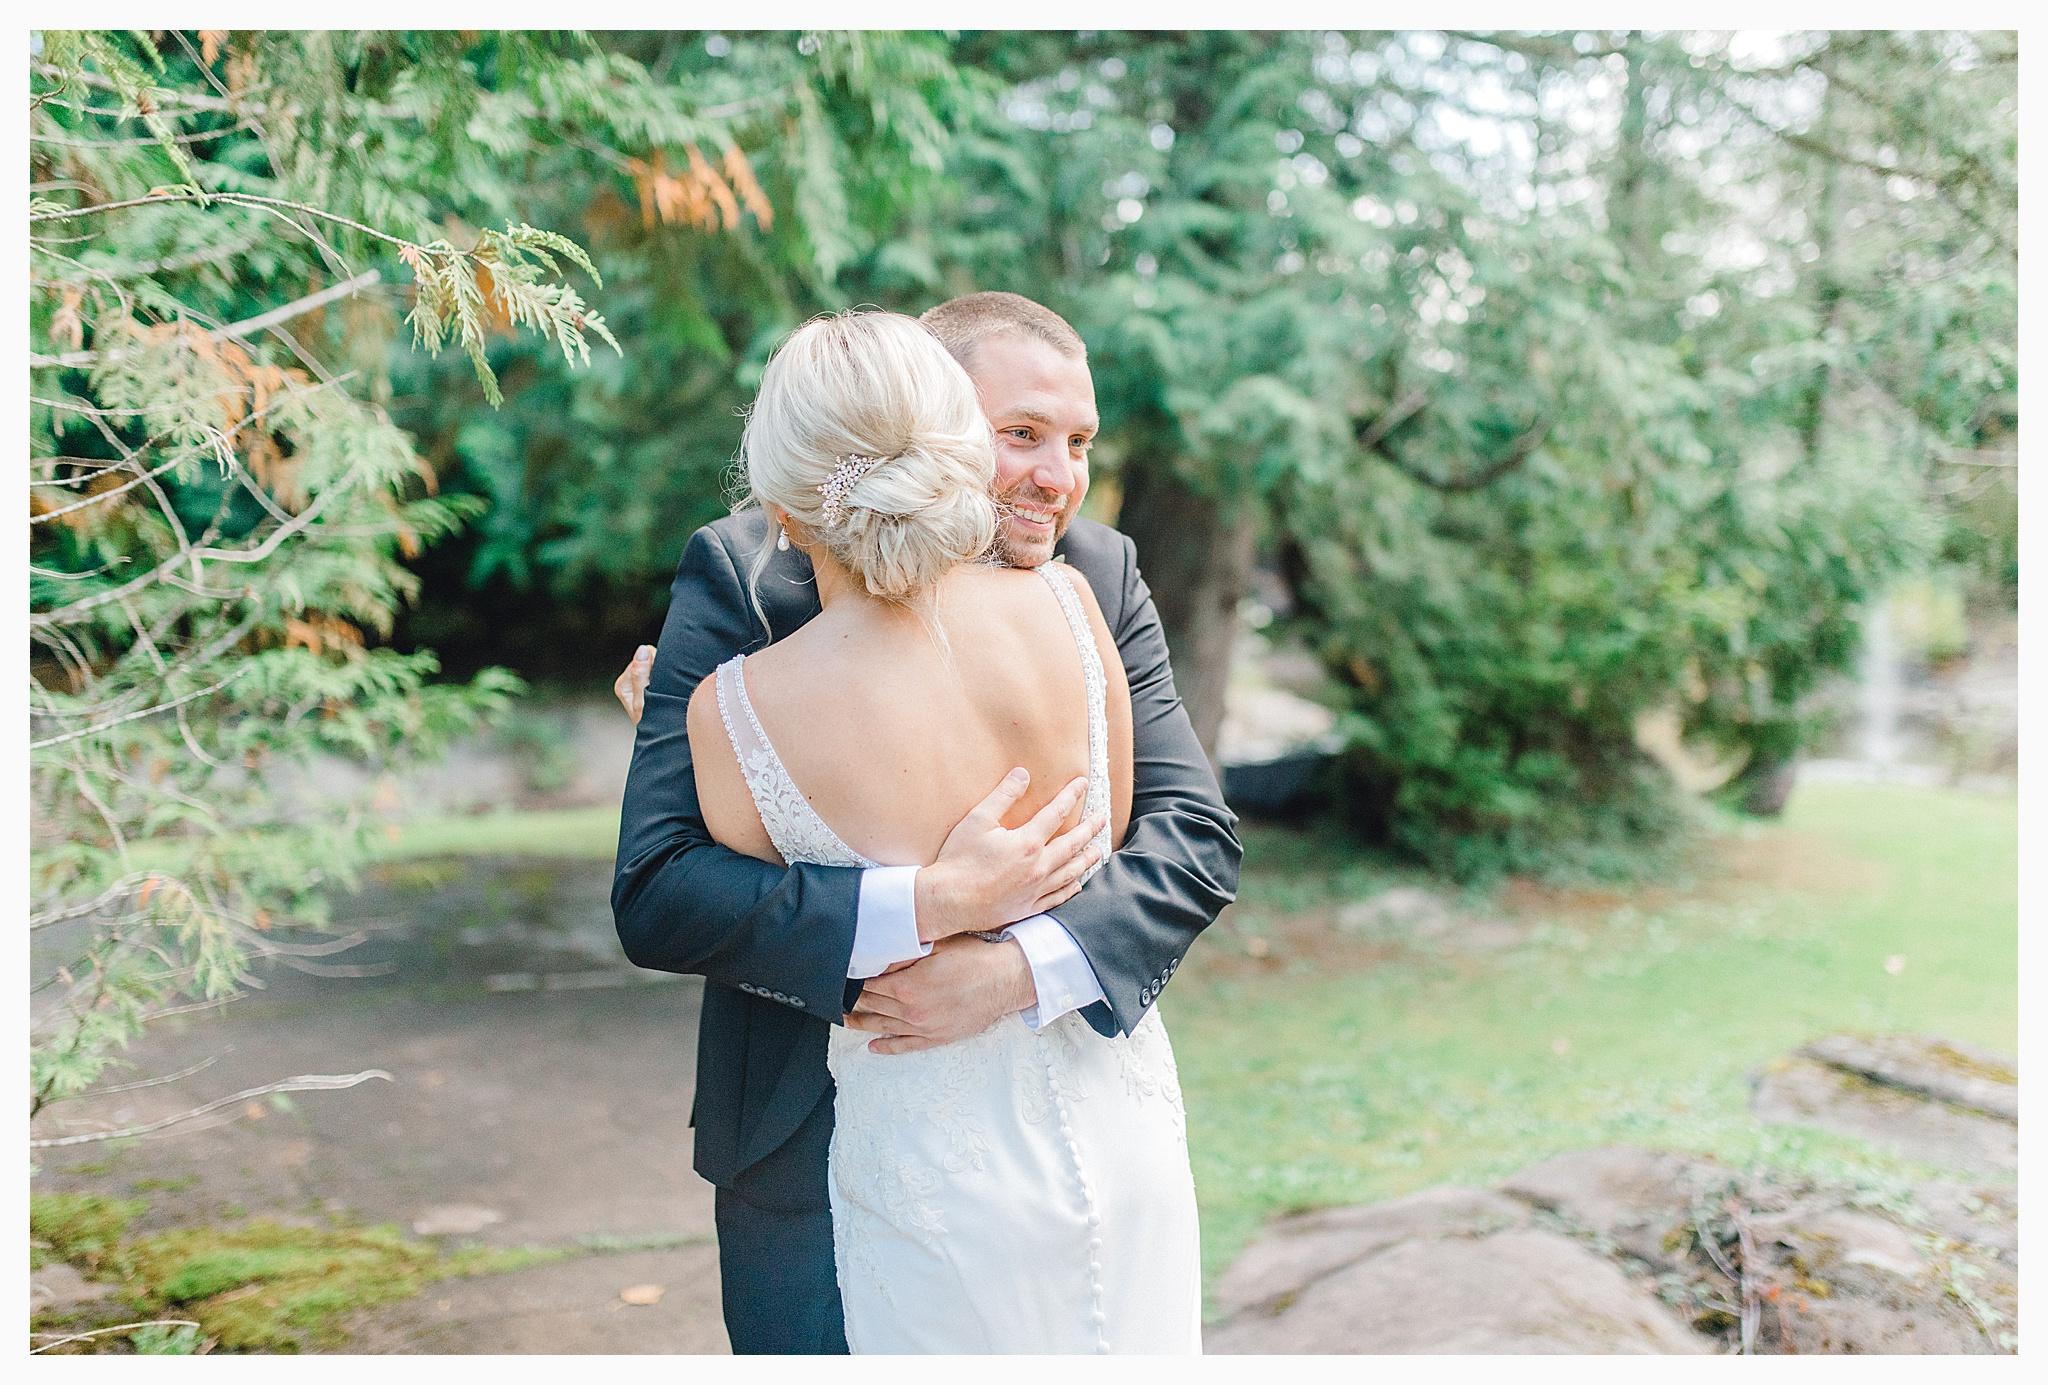 Emma Rose Company Light and Airy Wedding Photographer, Beautiful fall wedding at Rock Creek Gardens Venue in Puyallup, Washington._0023.jpg